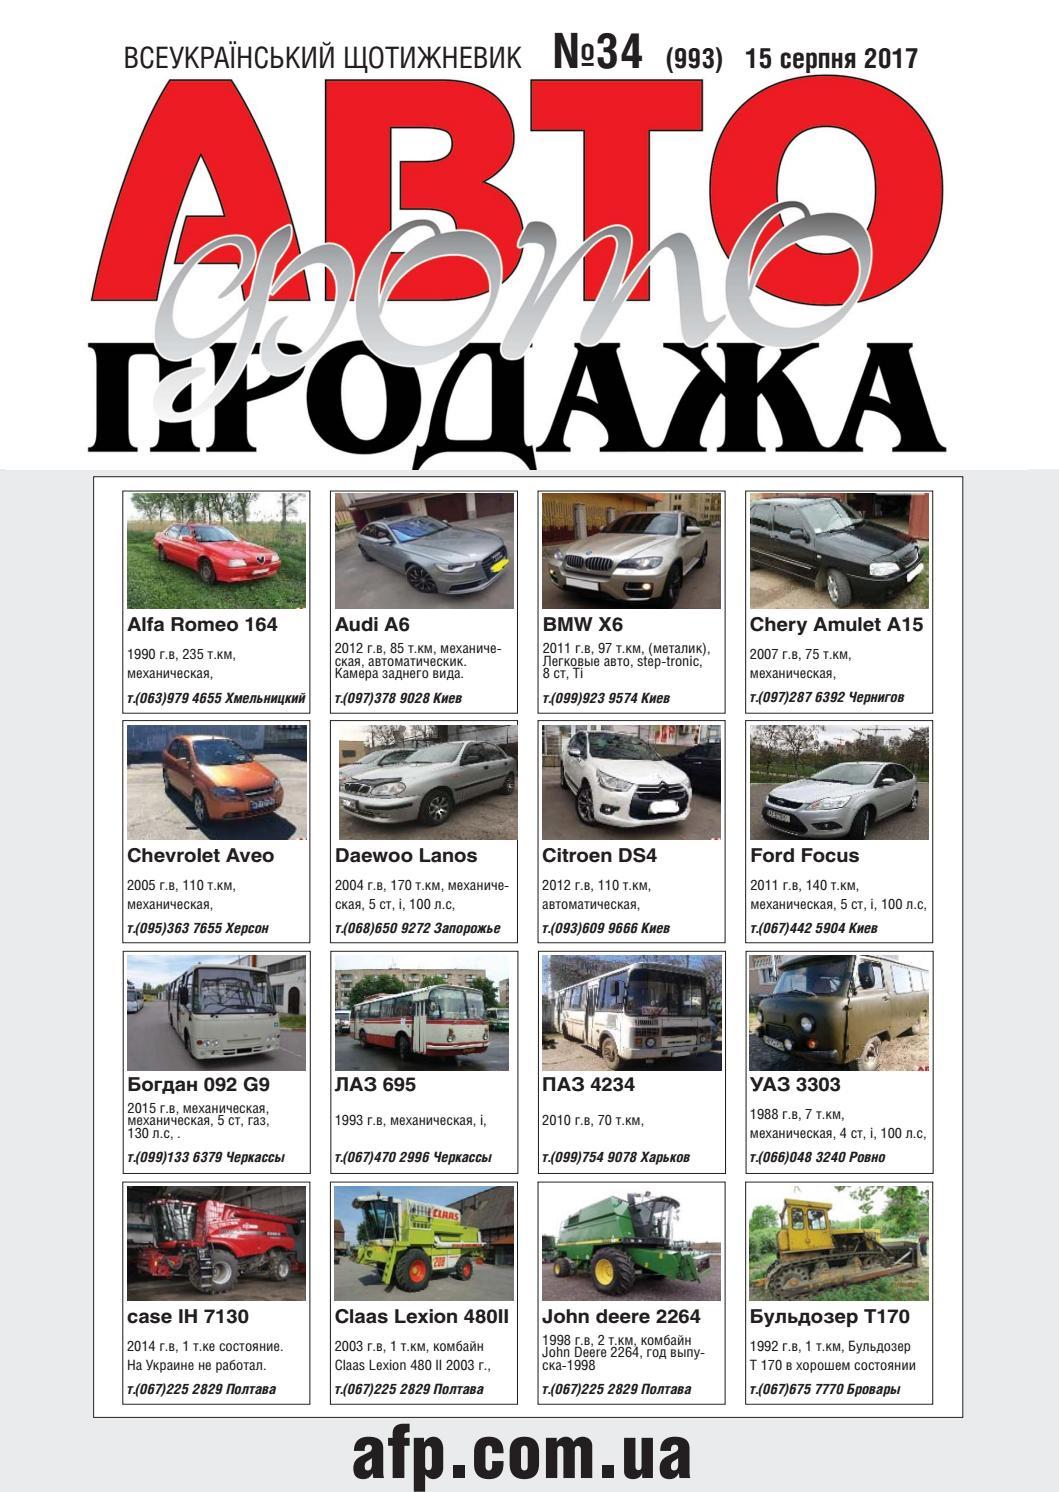 2003 suzuki intruder 1500 service manual